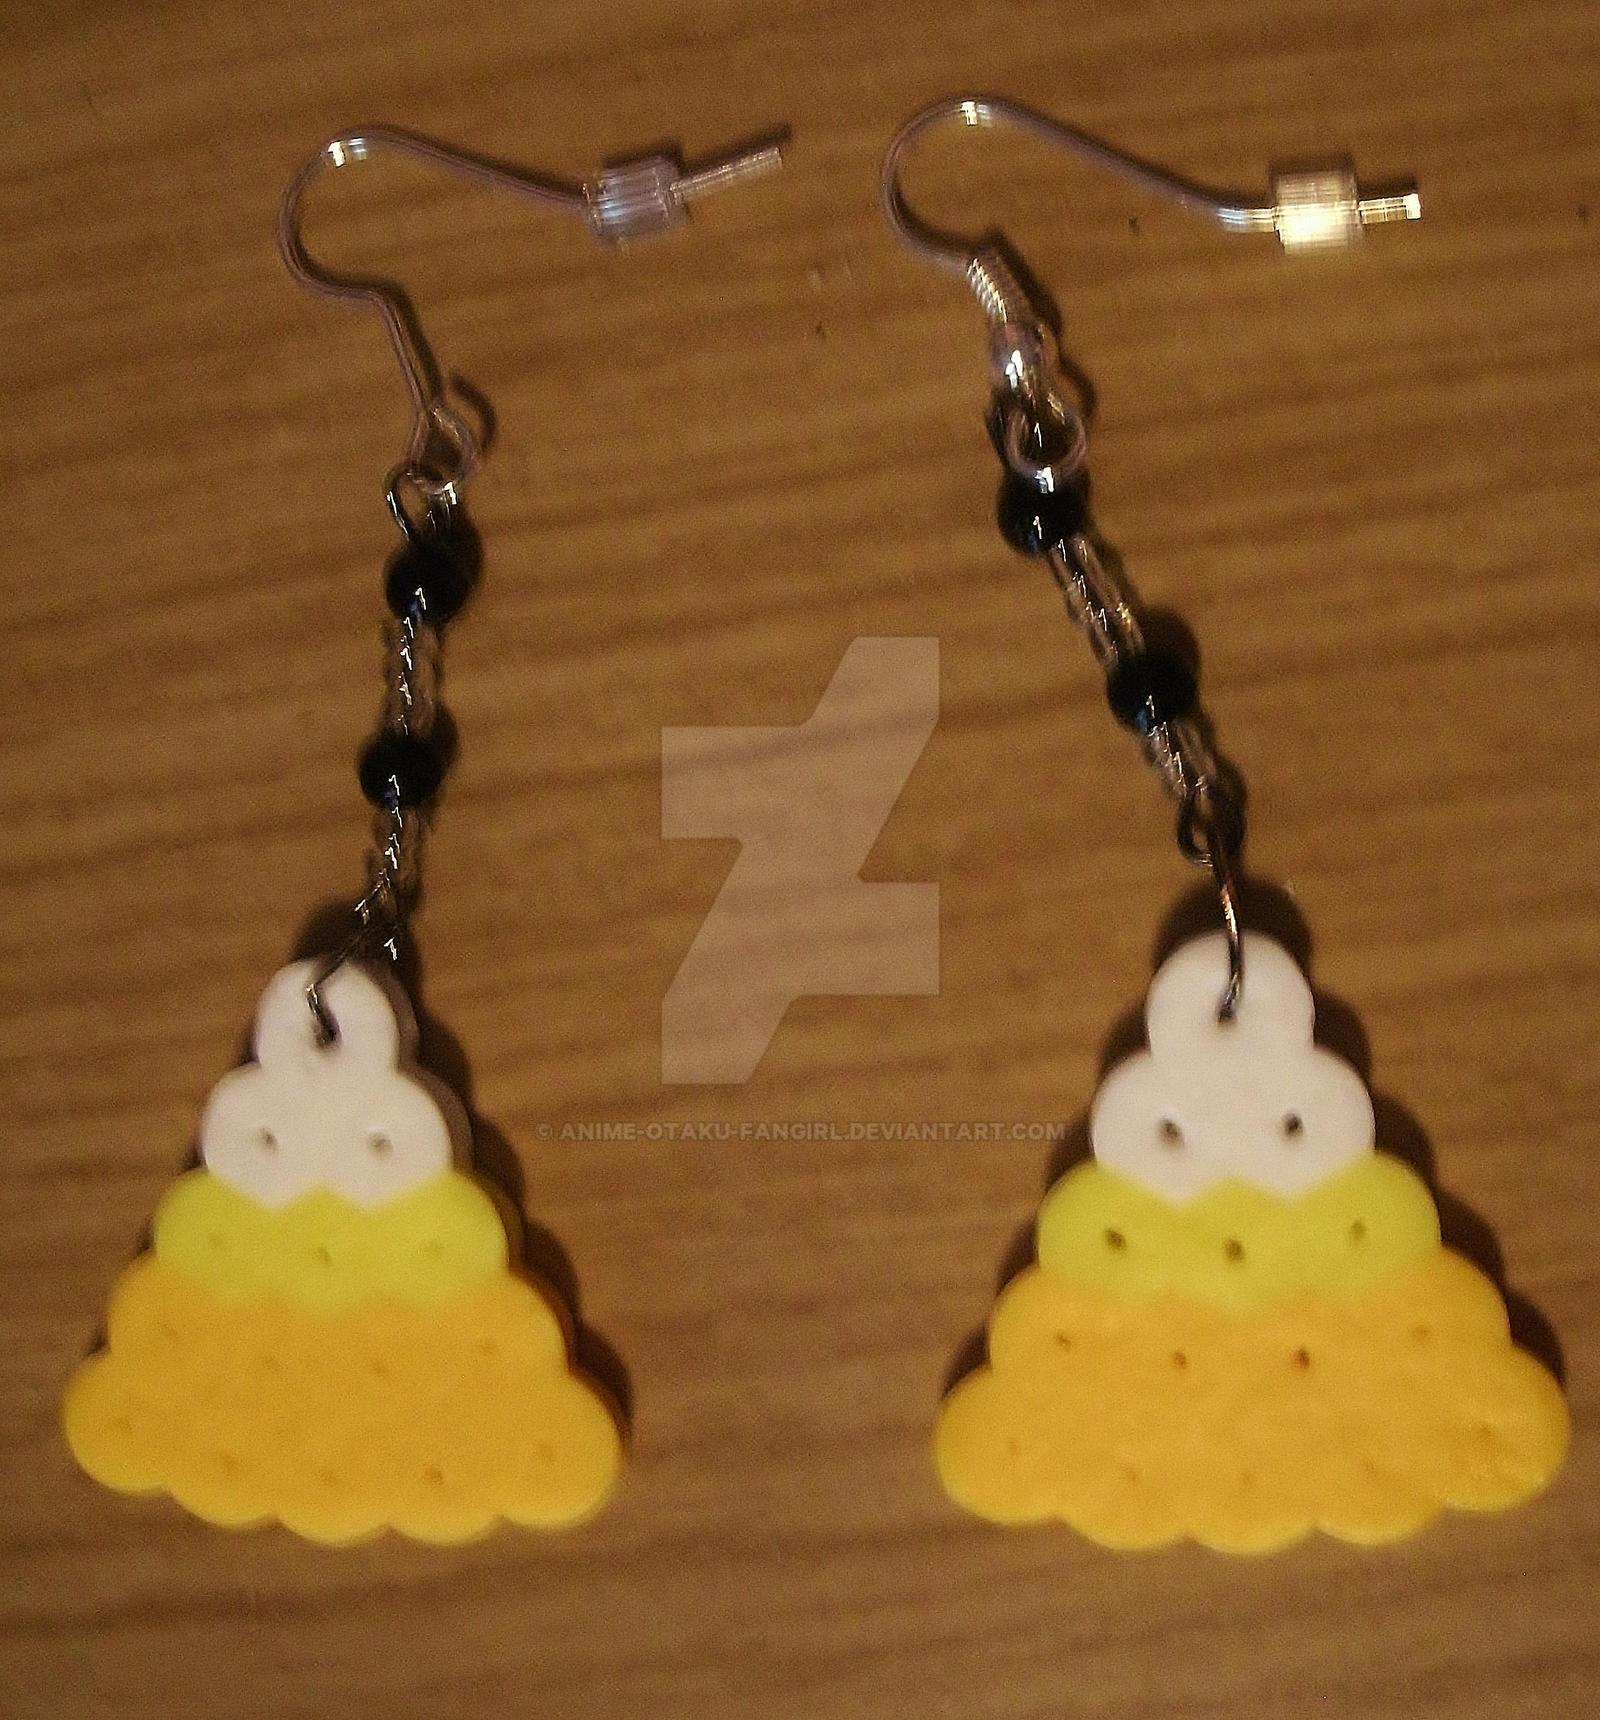 Candy Corn Earrings 1 By Animeotakufangirl